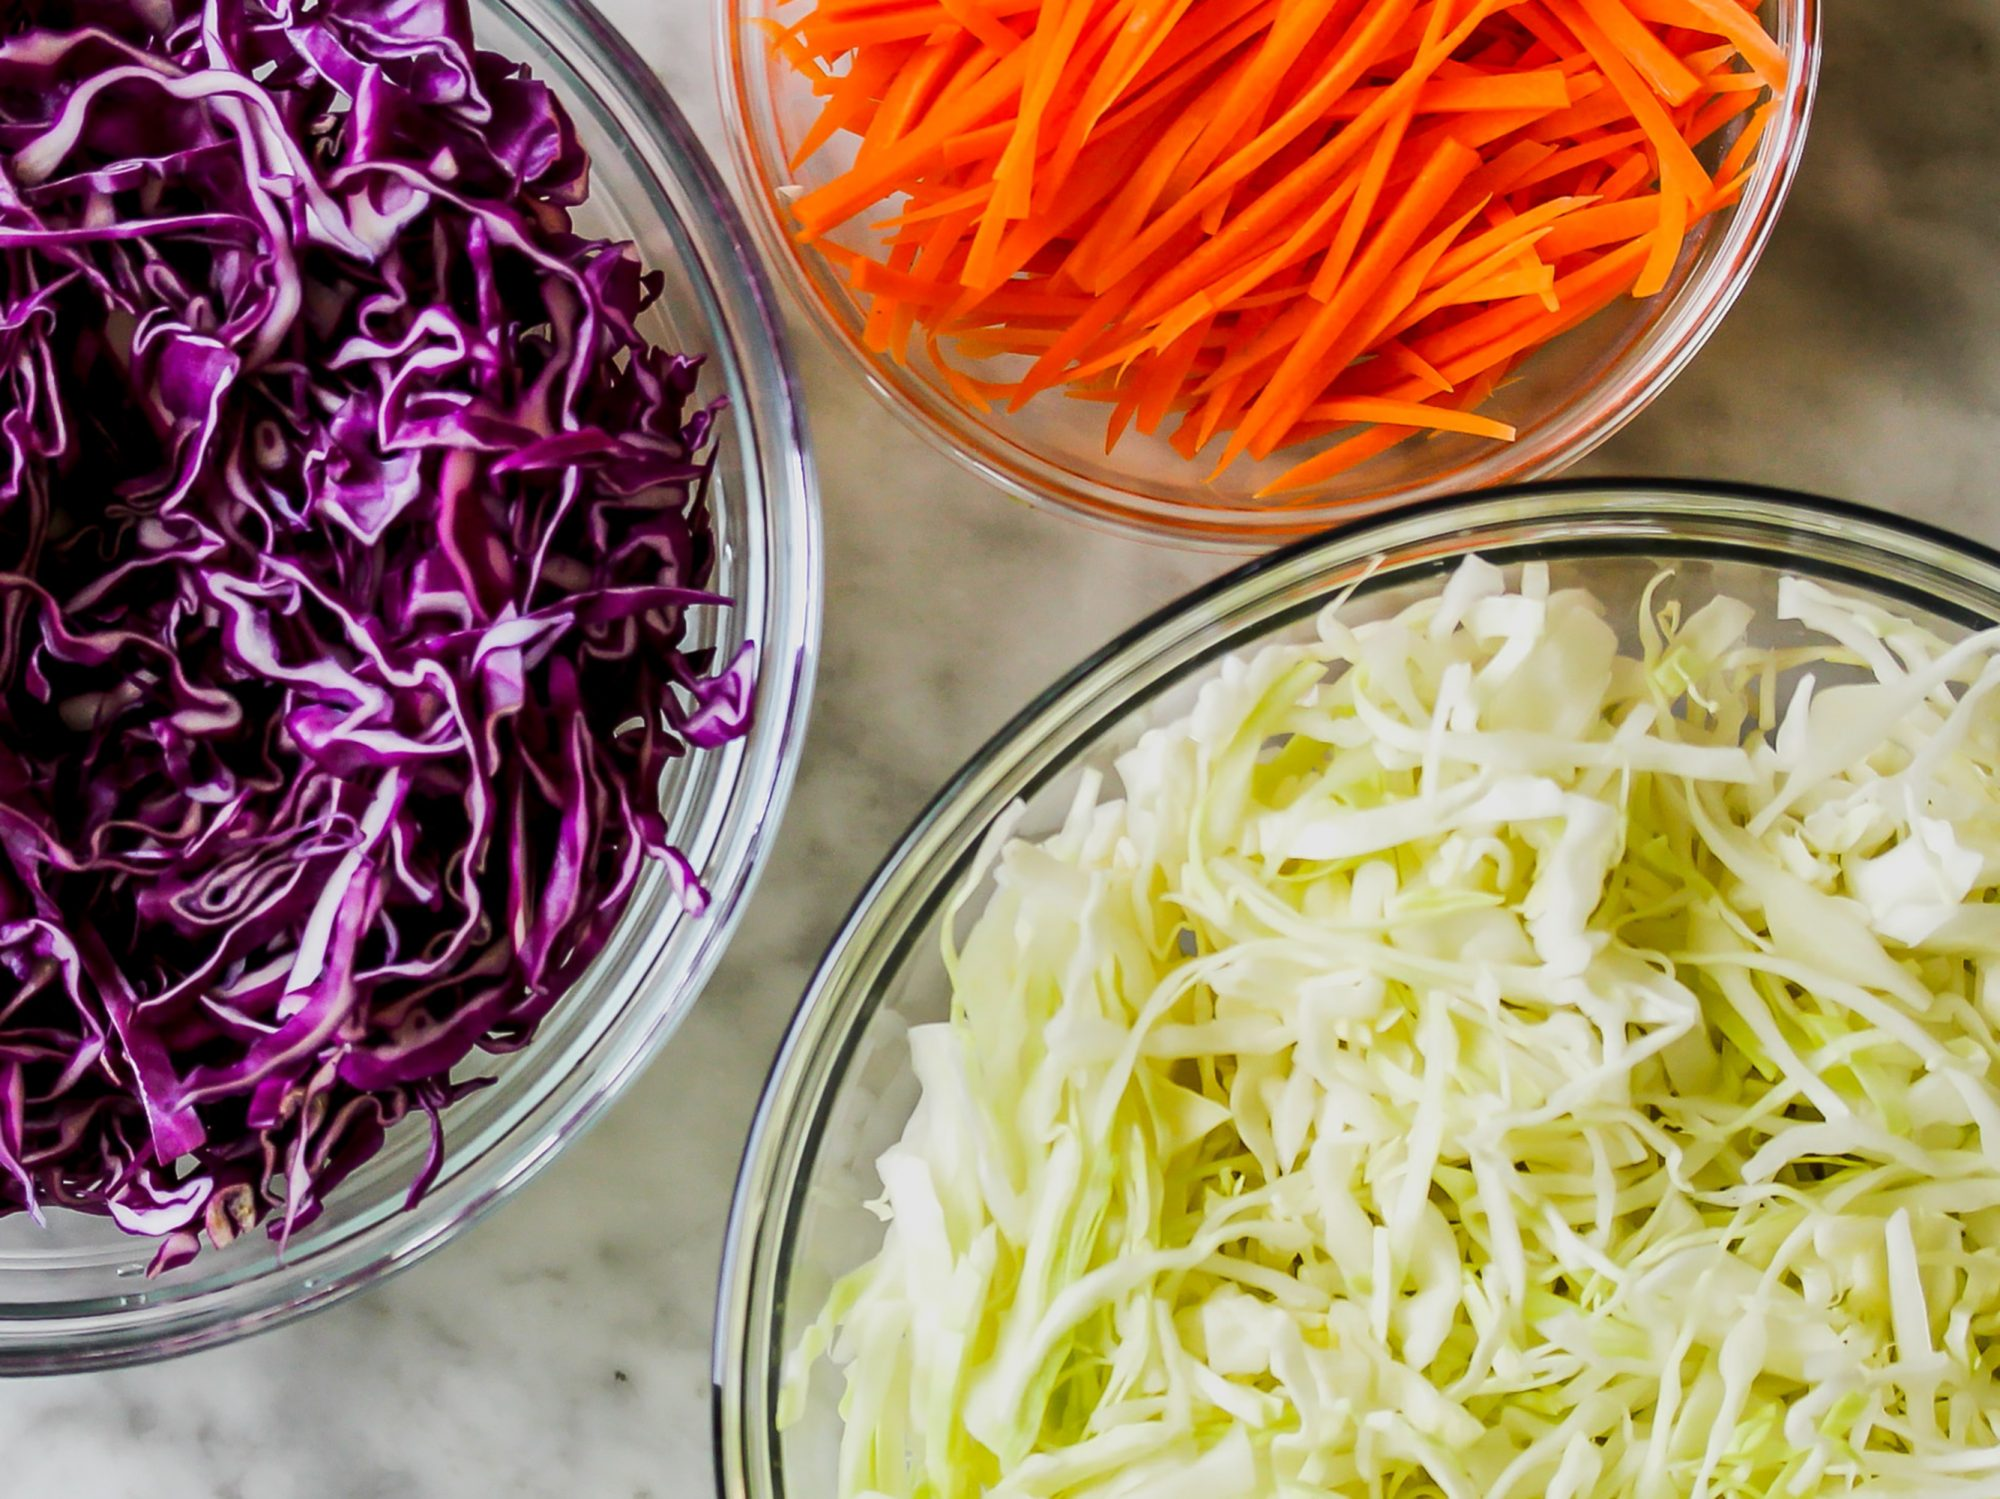 Basic Coleslaw Ingredients